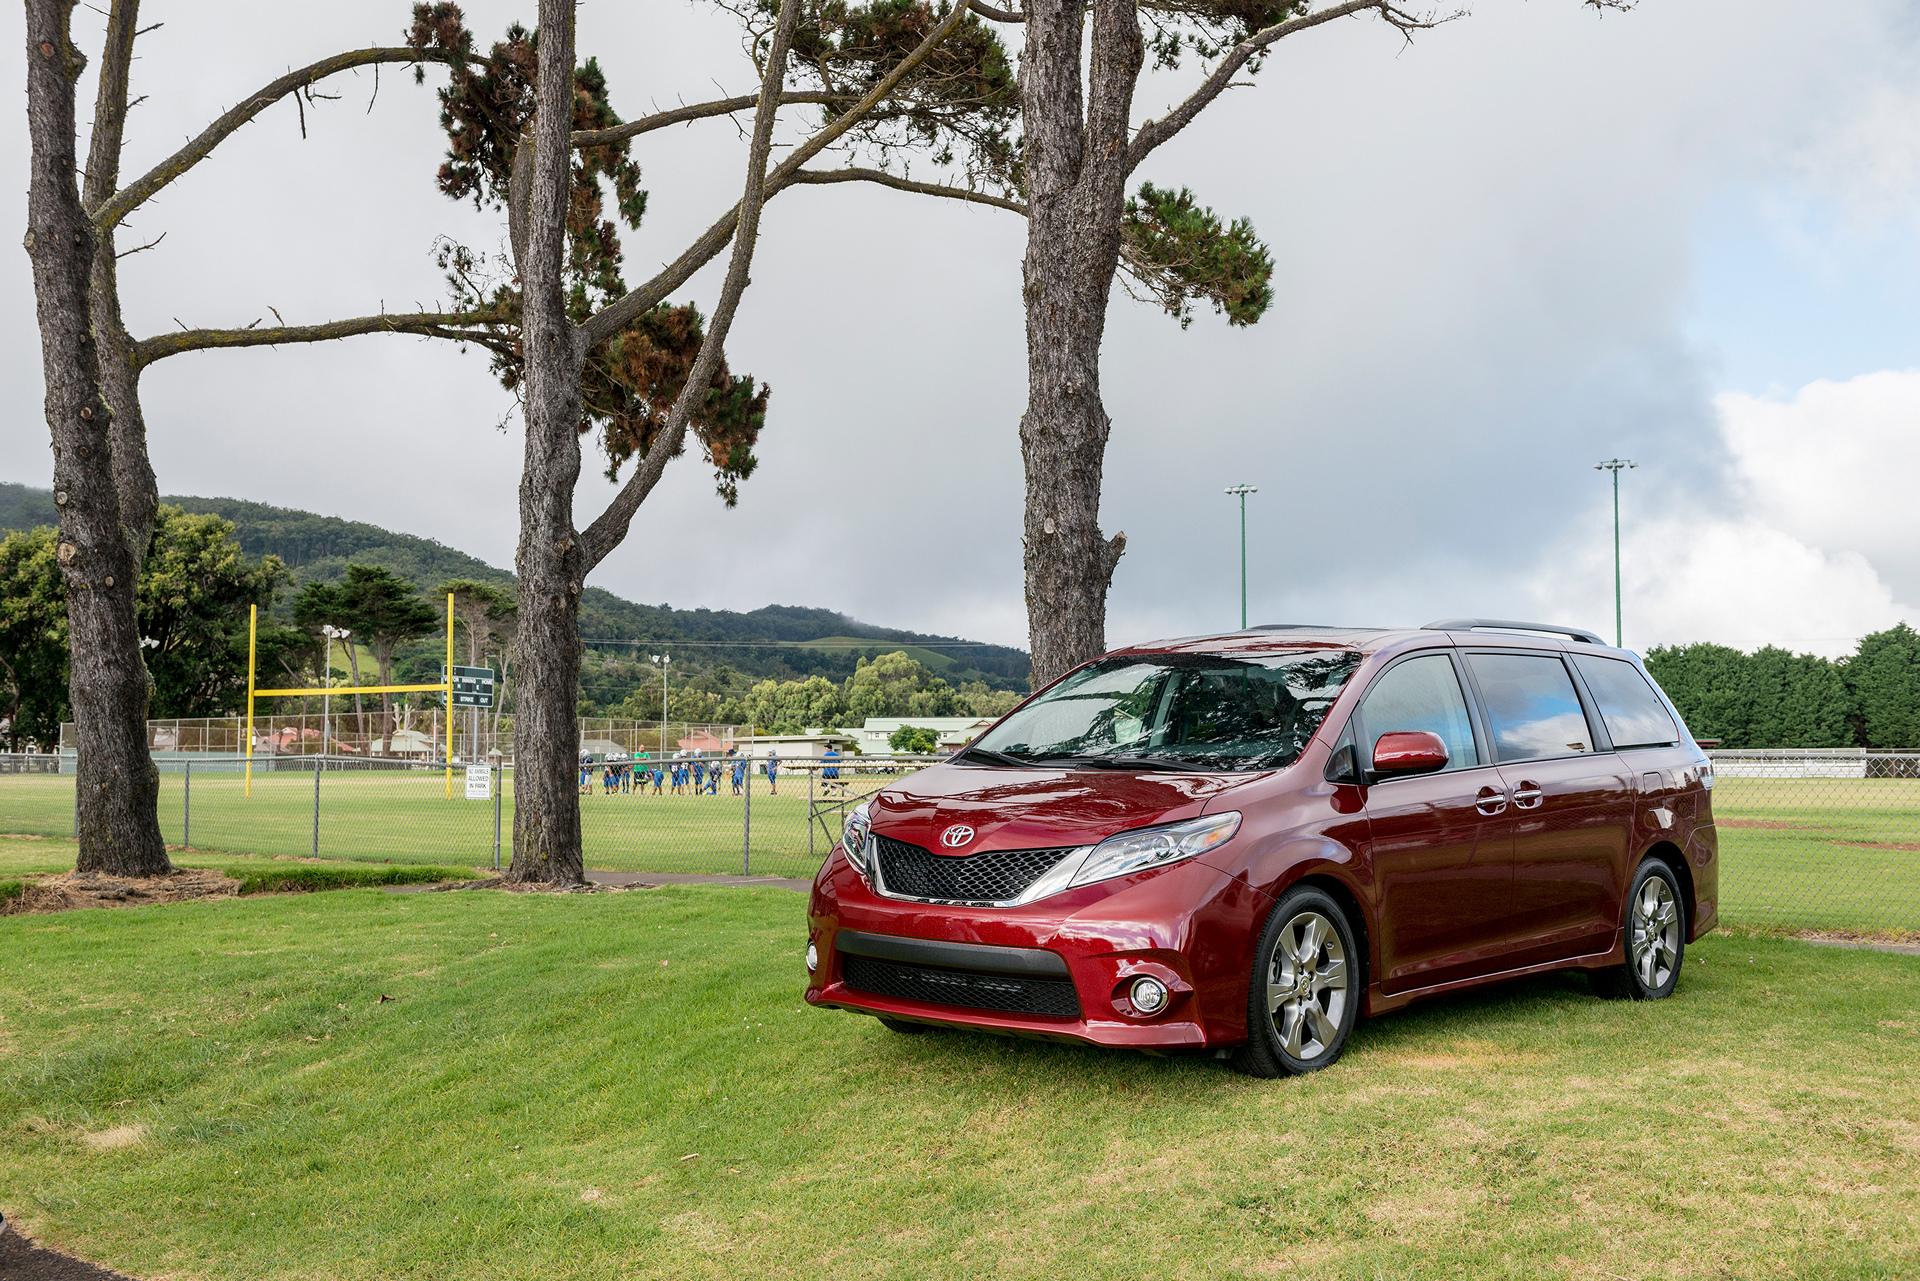 2017 Toyota Sienna © Toyota Motor Corporation